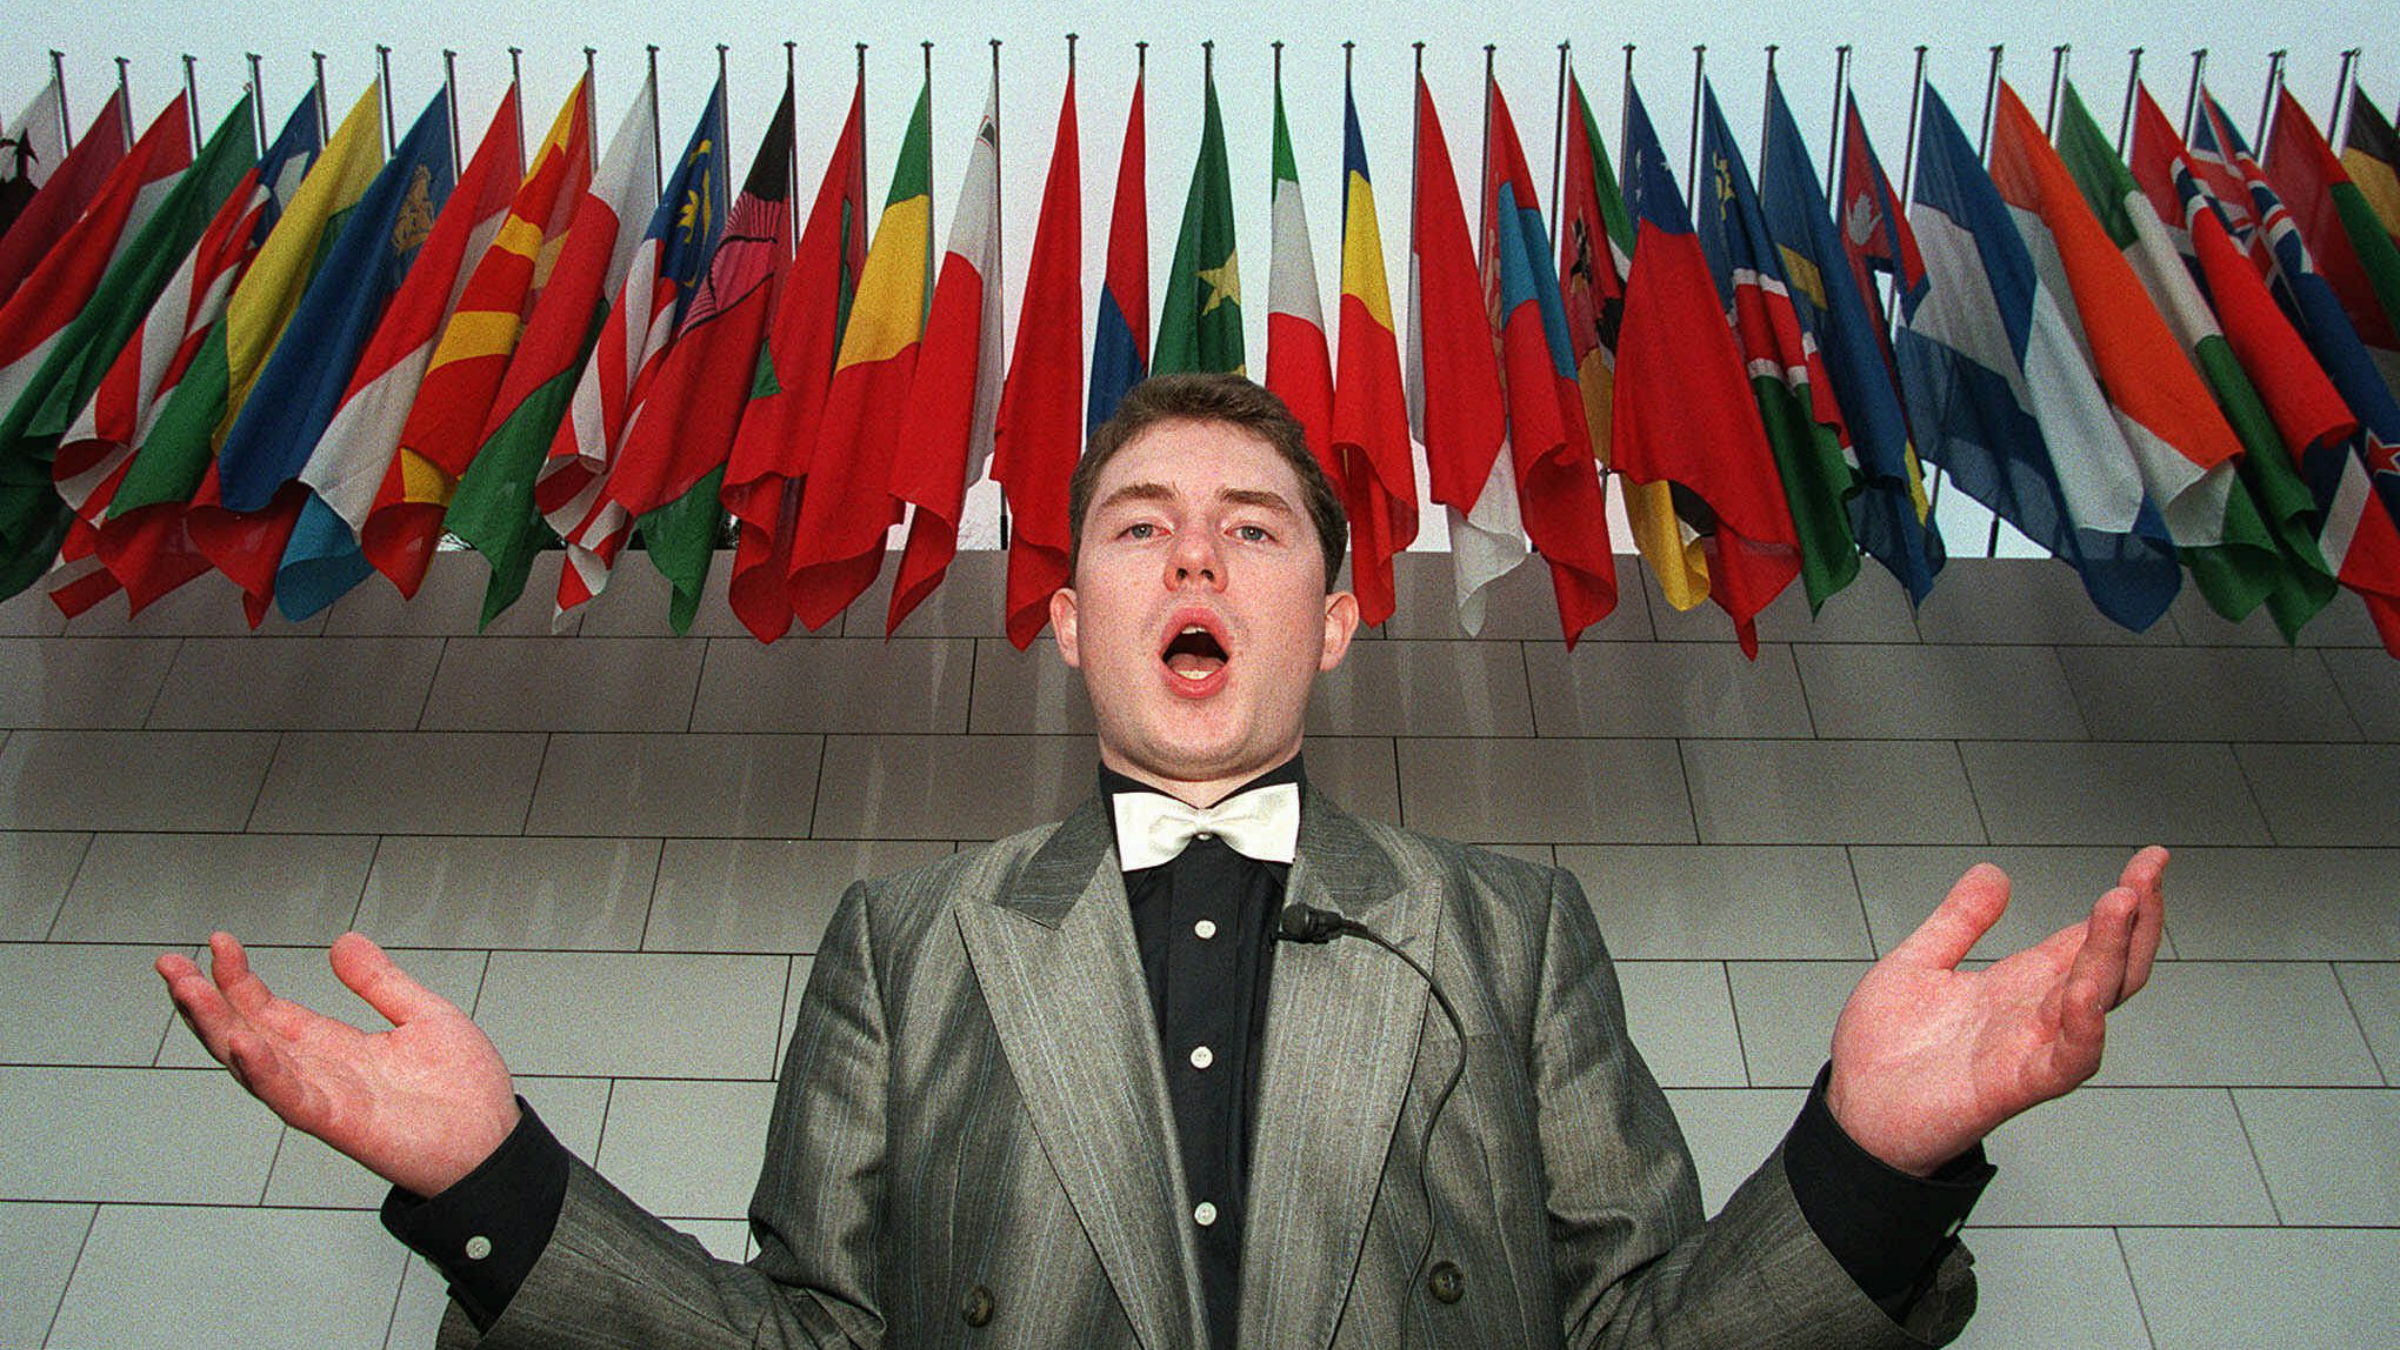 Multilingual Swiss singer Michel Sauser